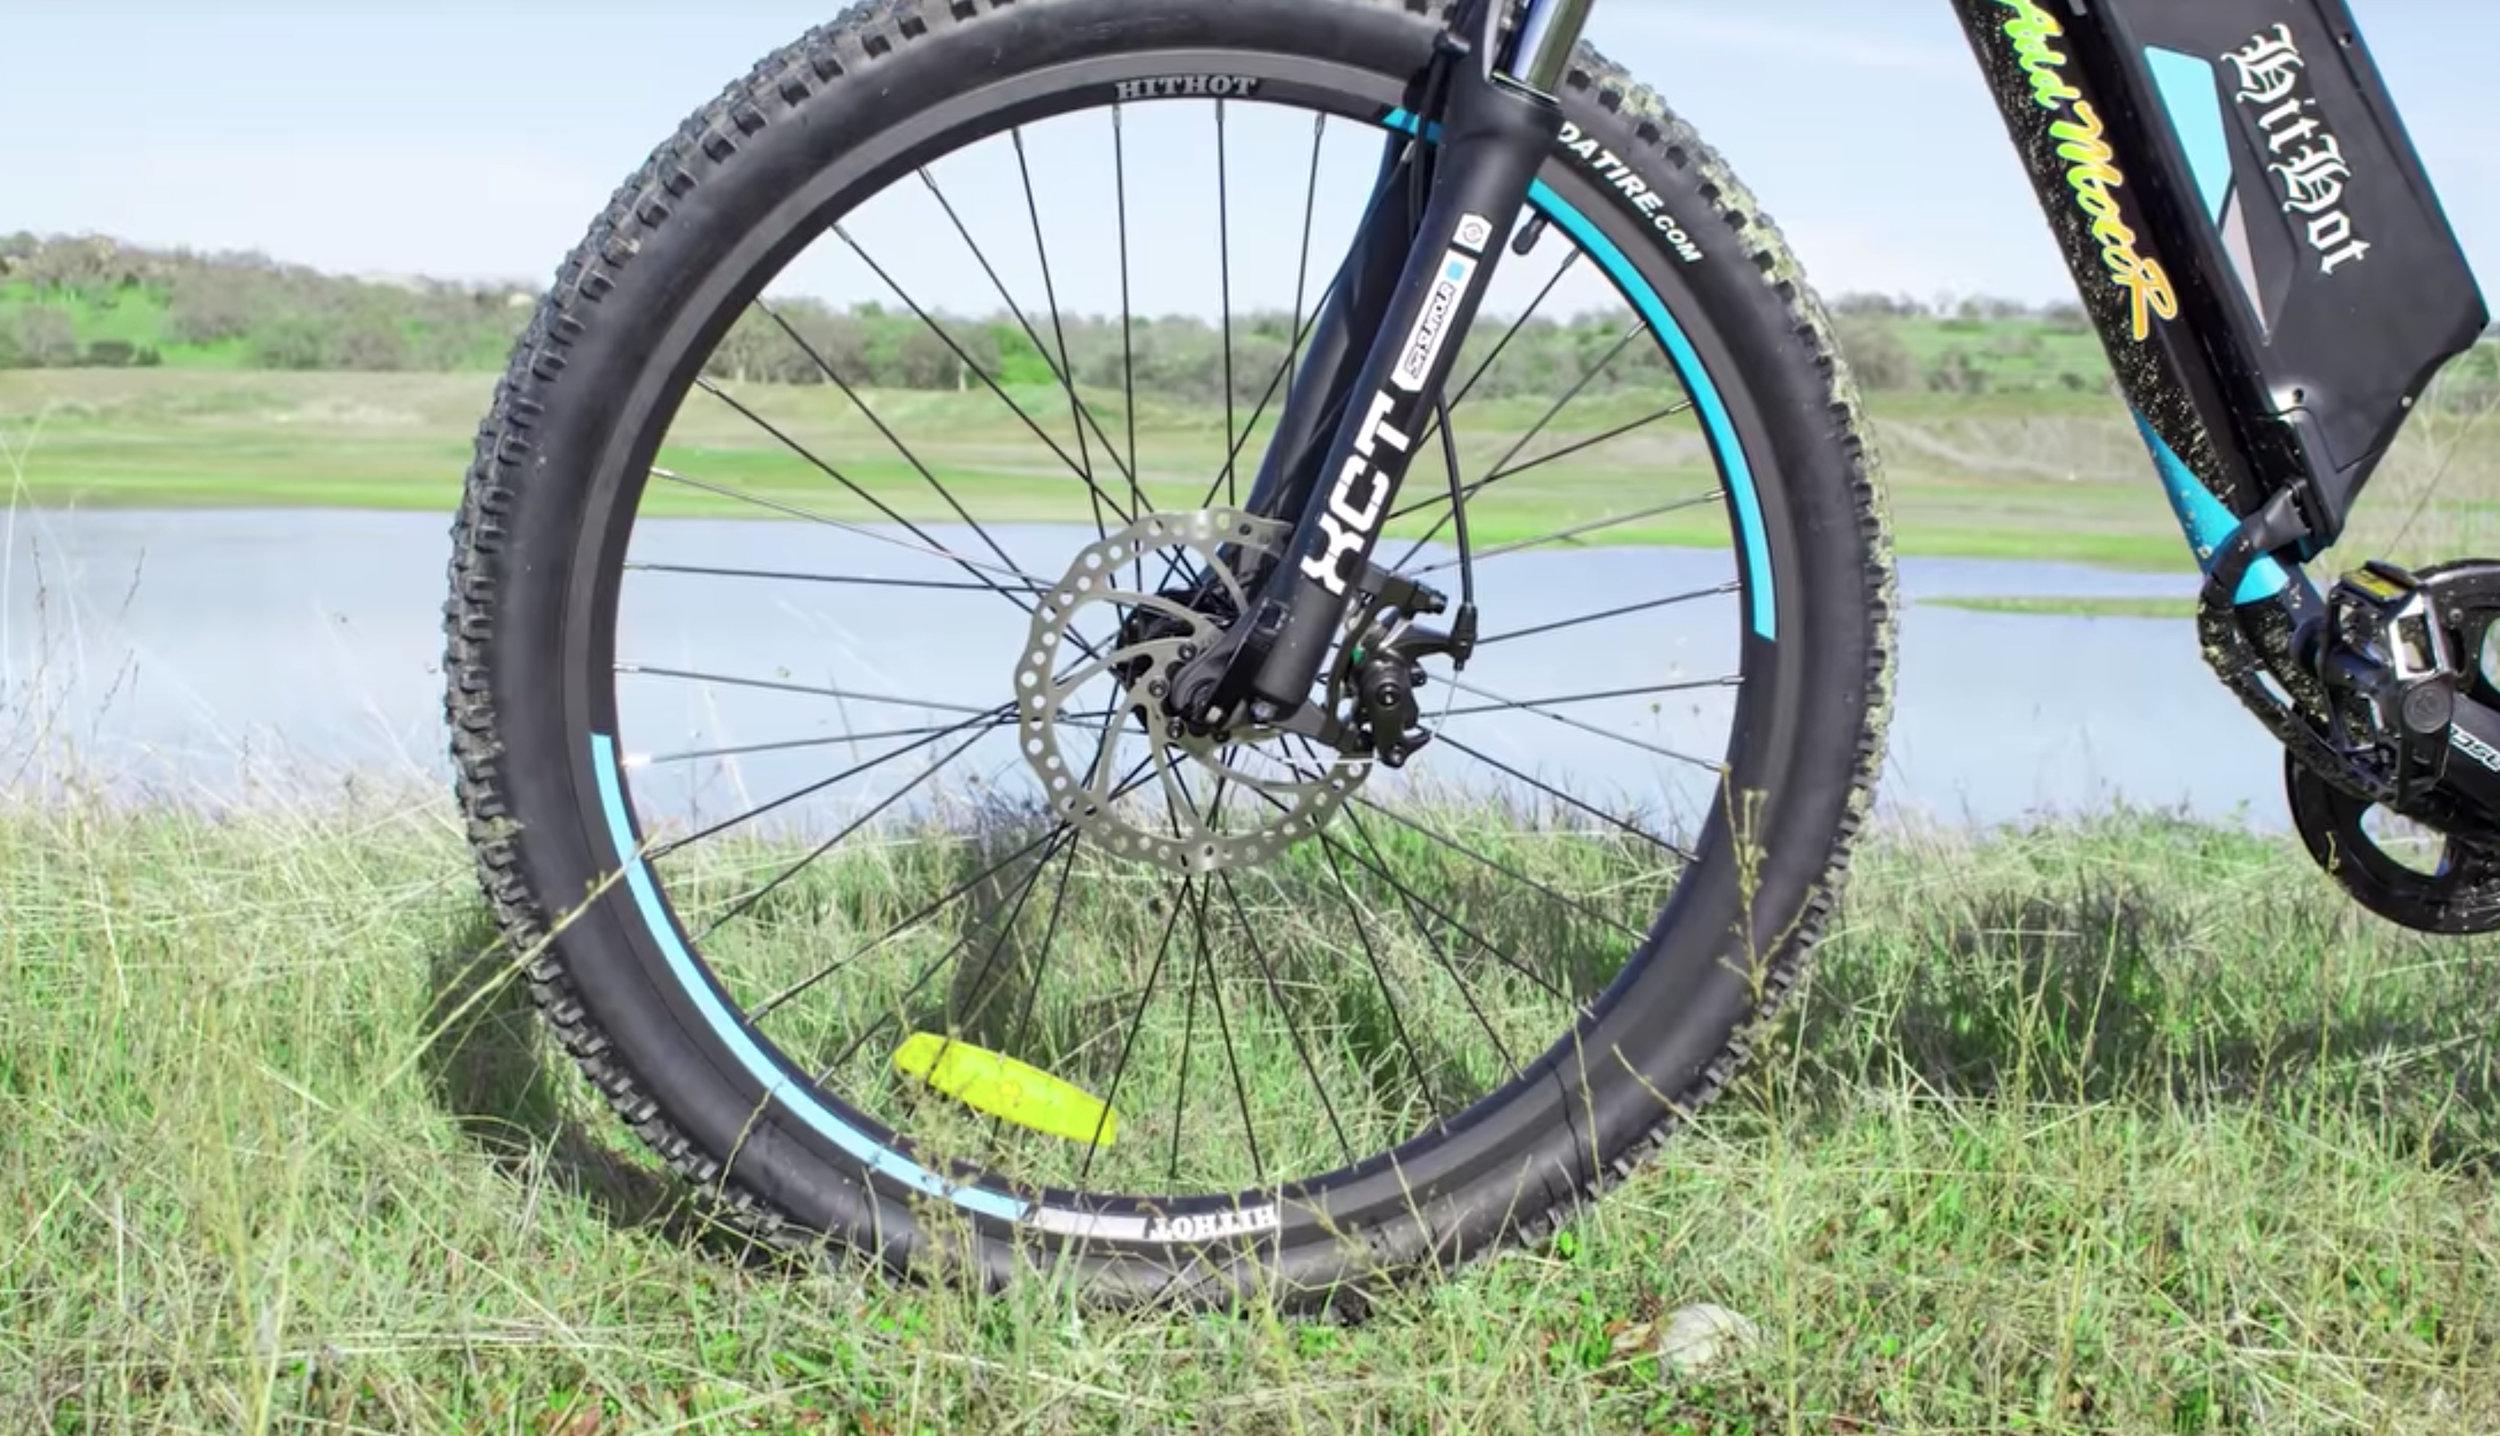 electrified-reviews-addmotor-hithot-h1-electric-bike-review-disc-brake.jpg